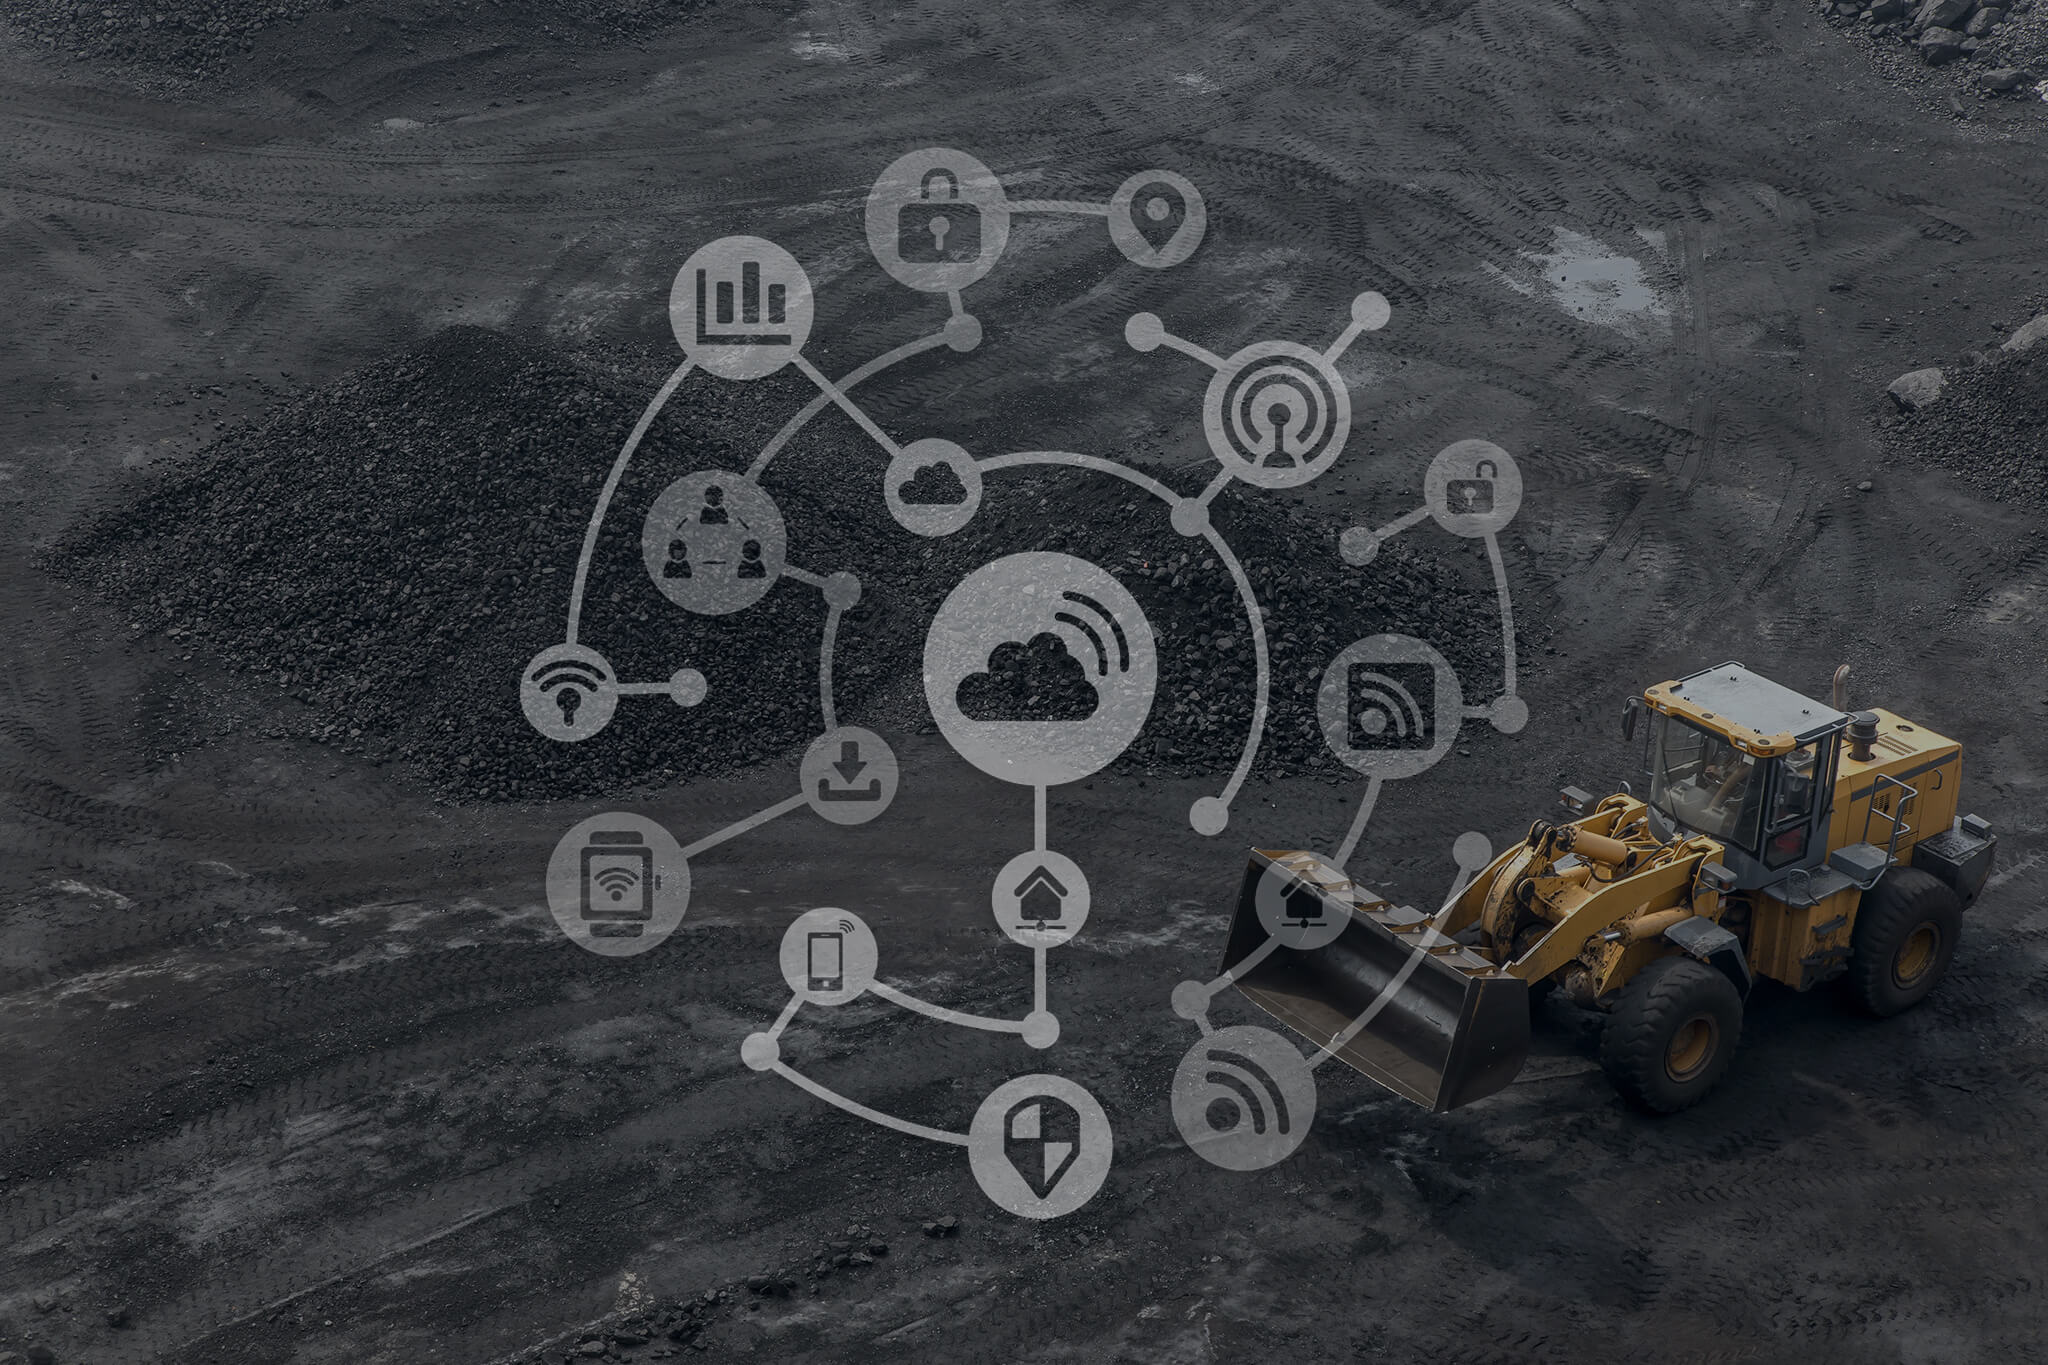 IoT, digital, connection, mining machines,